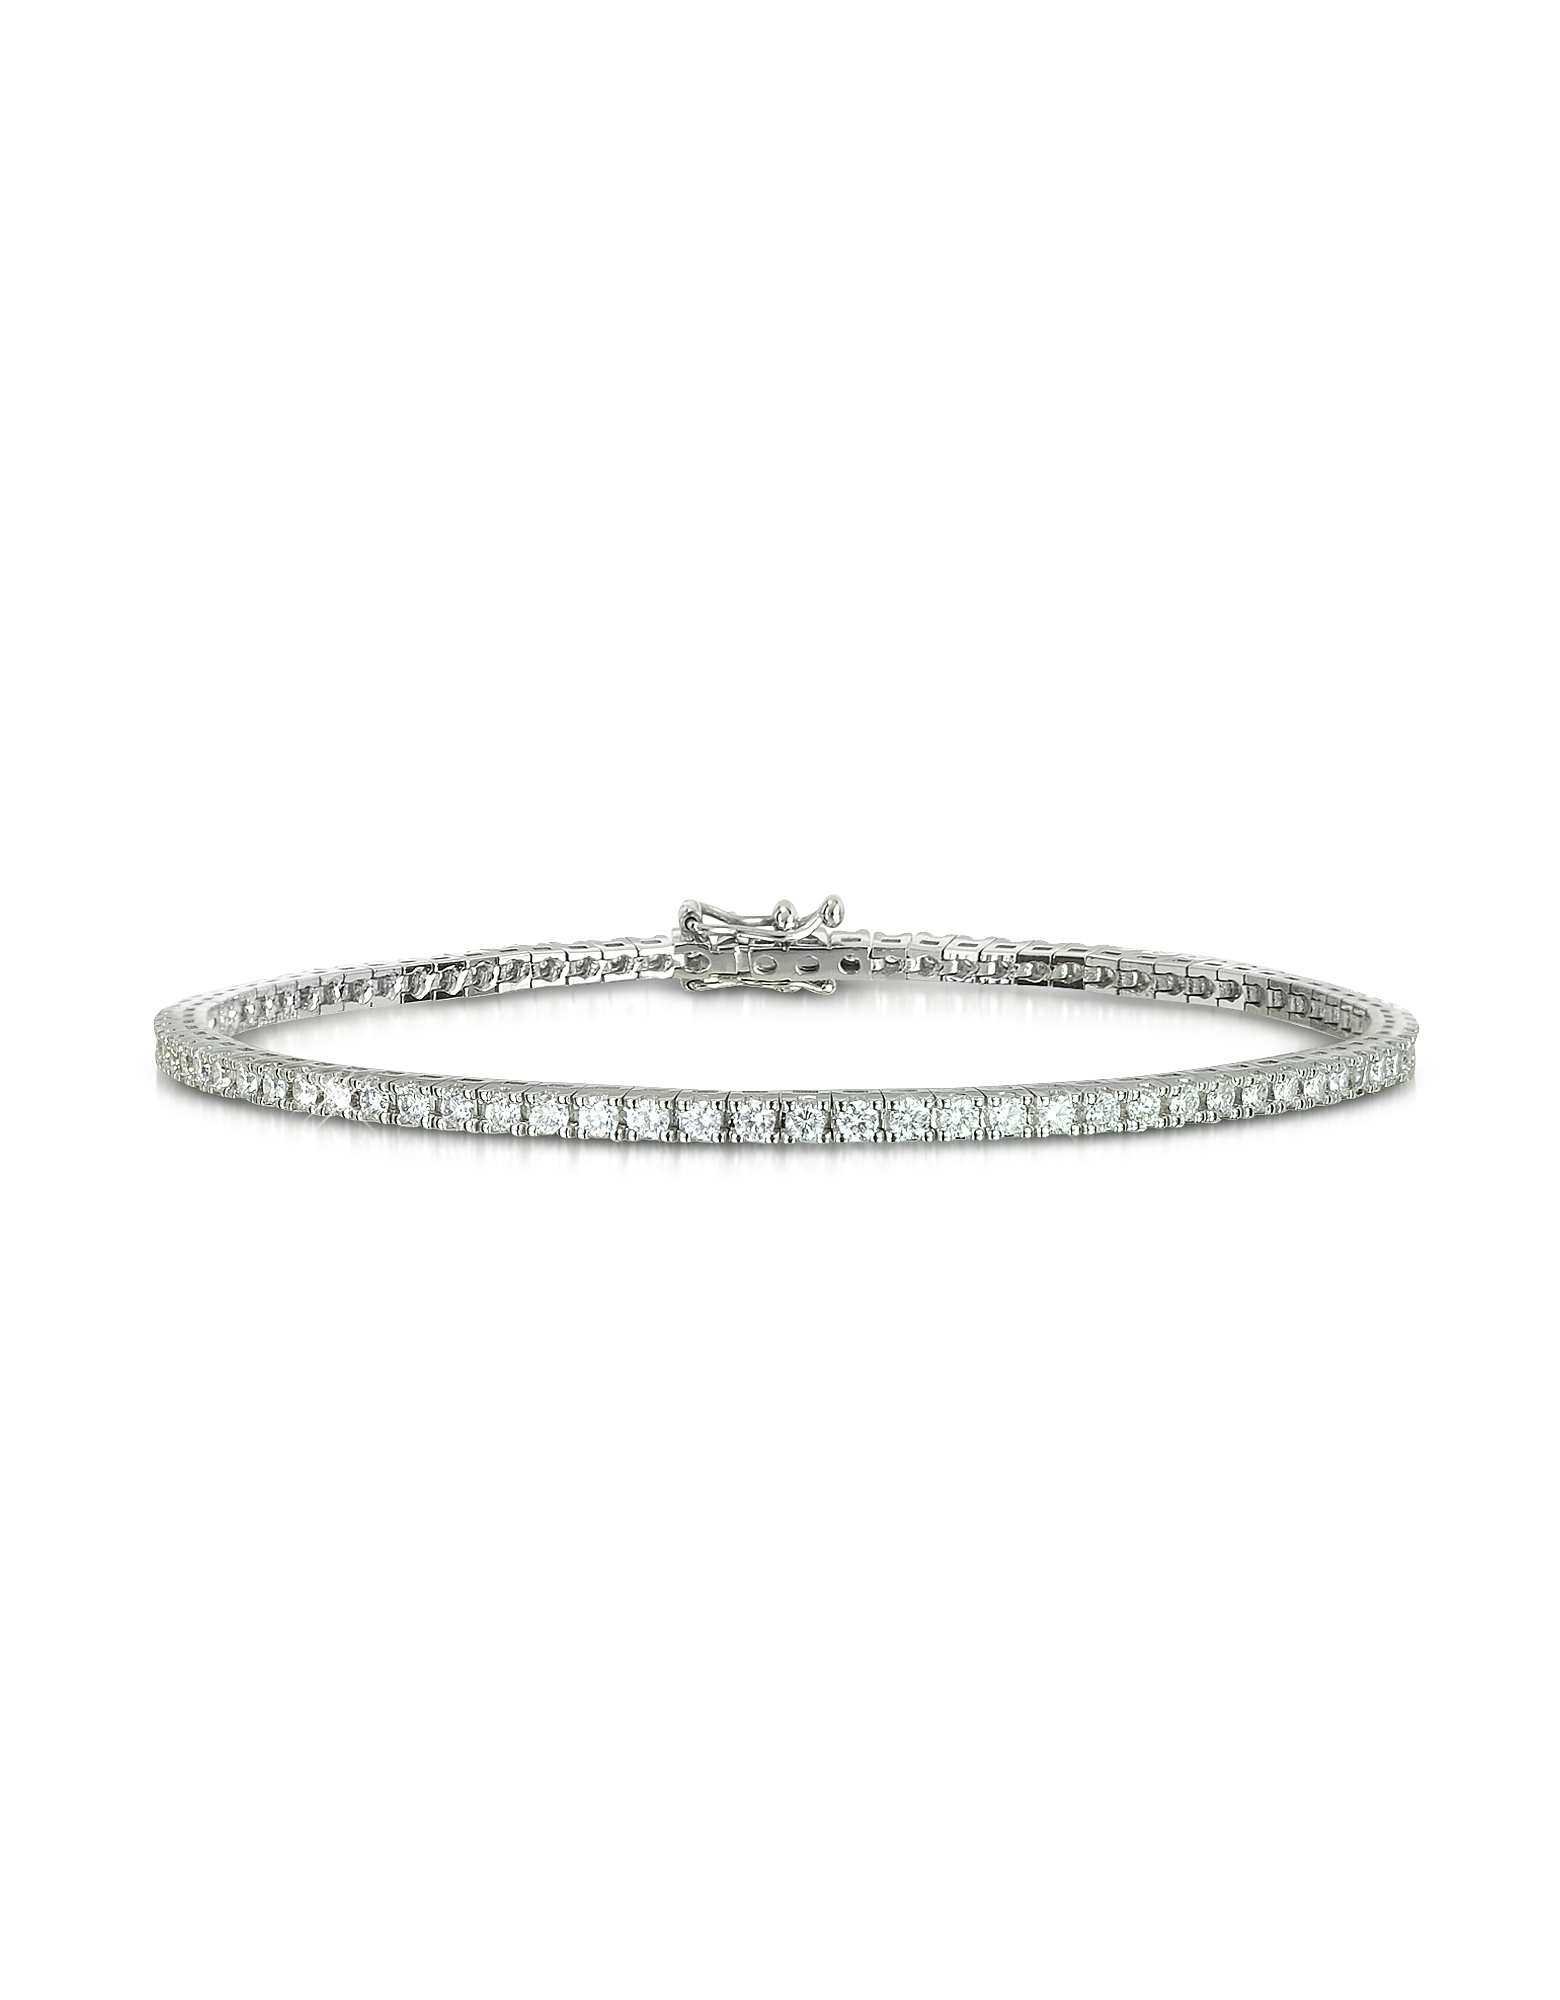 Forzieri Designer Bracelets, 1.56 ctw Diamond 18K White Gold Tennis Bracelet